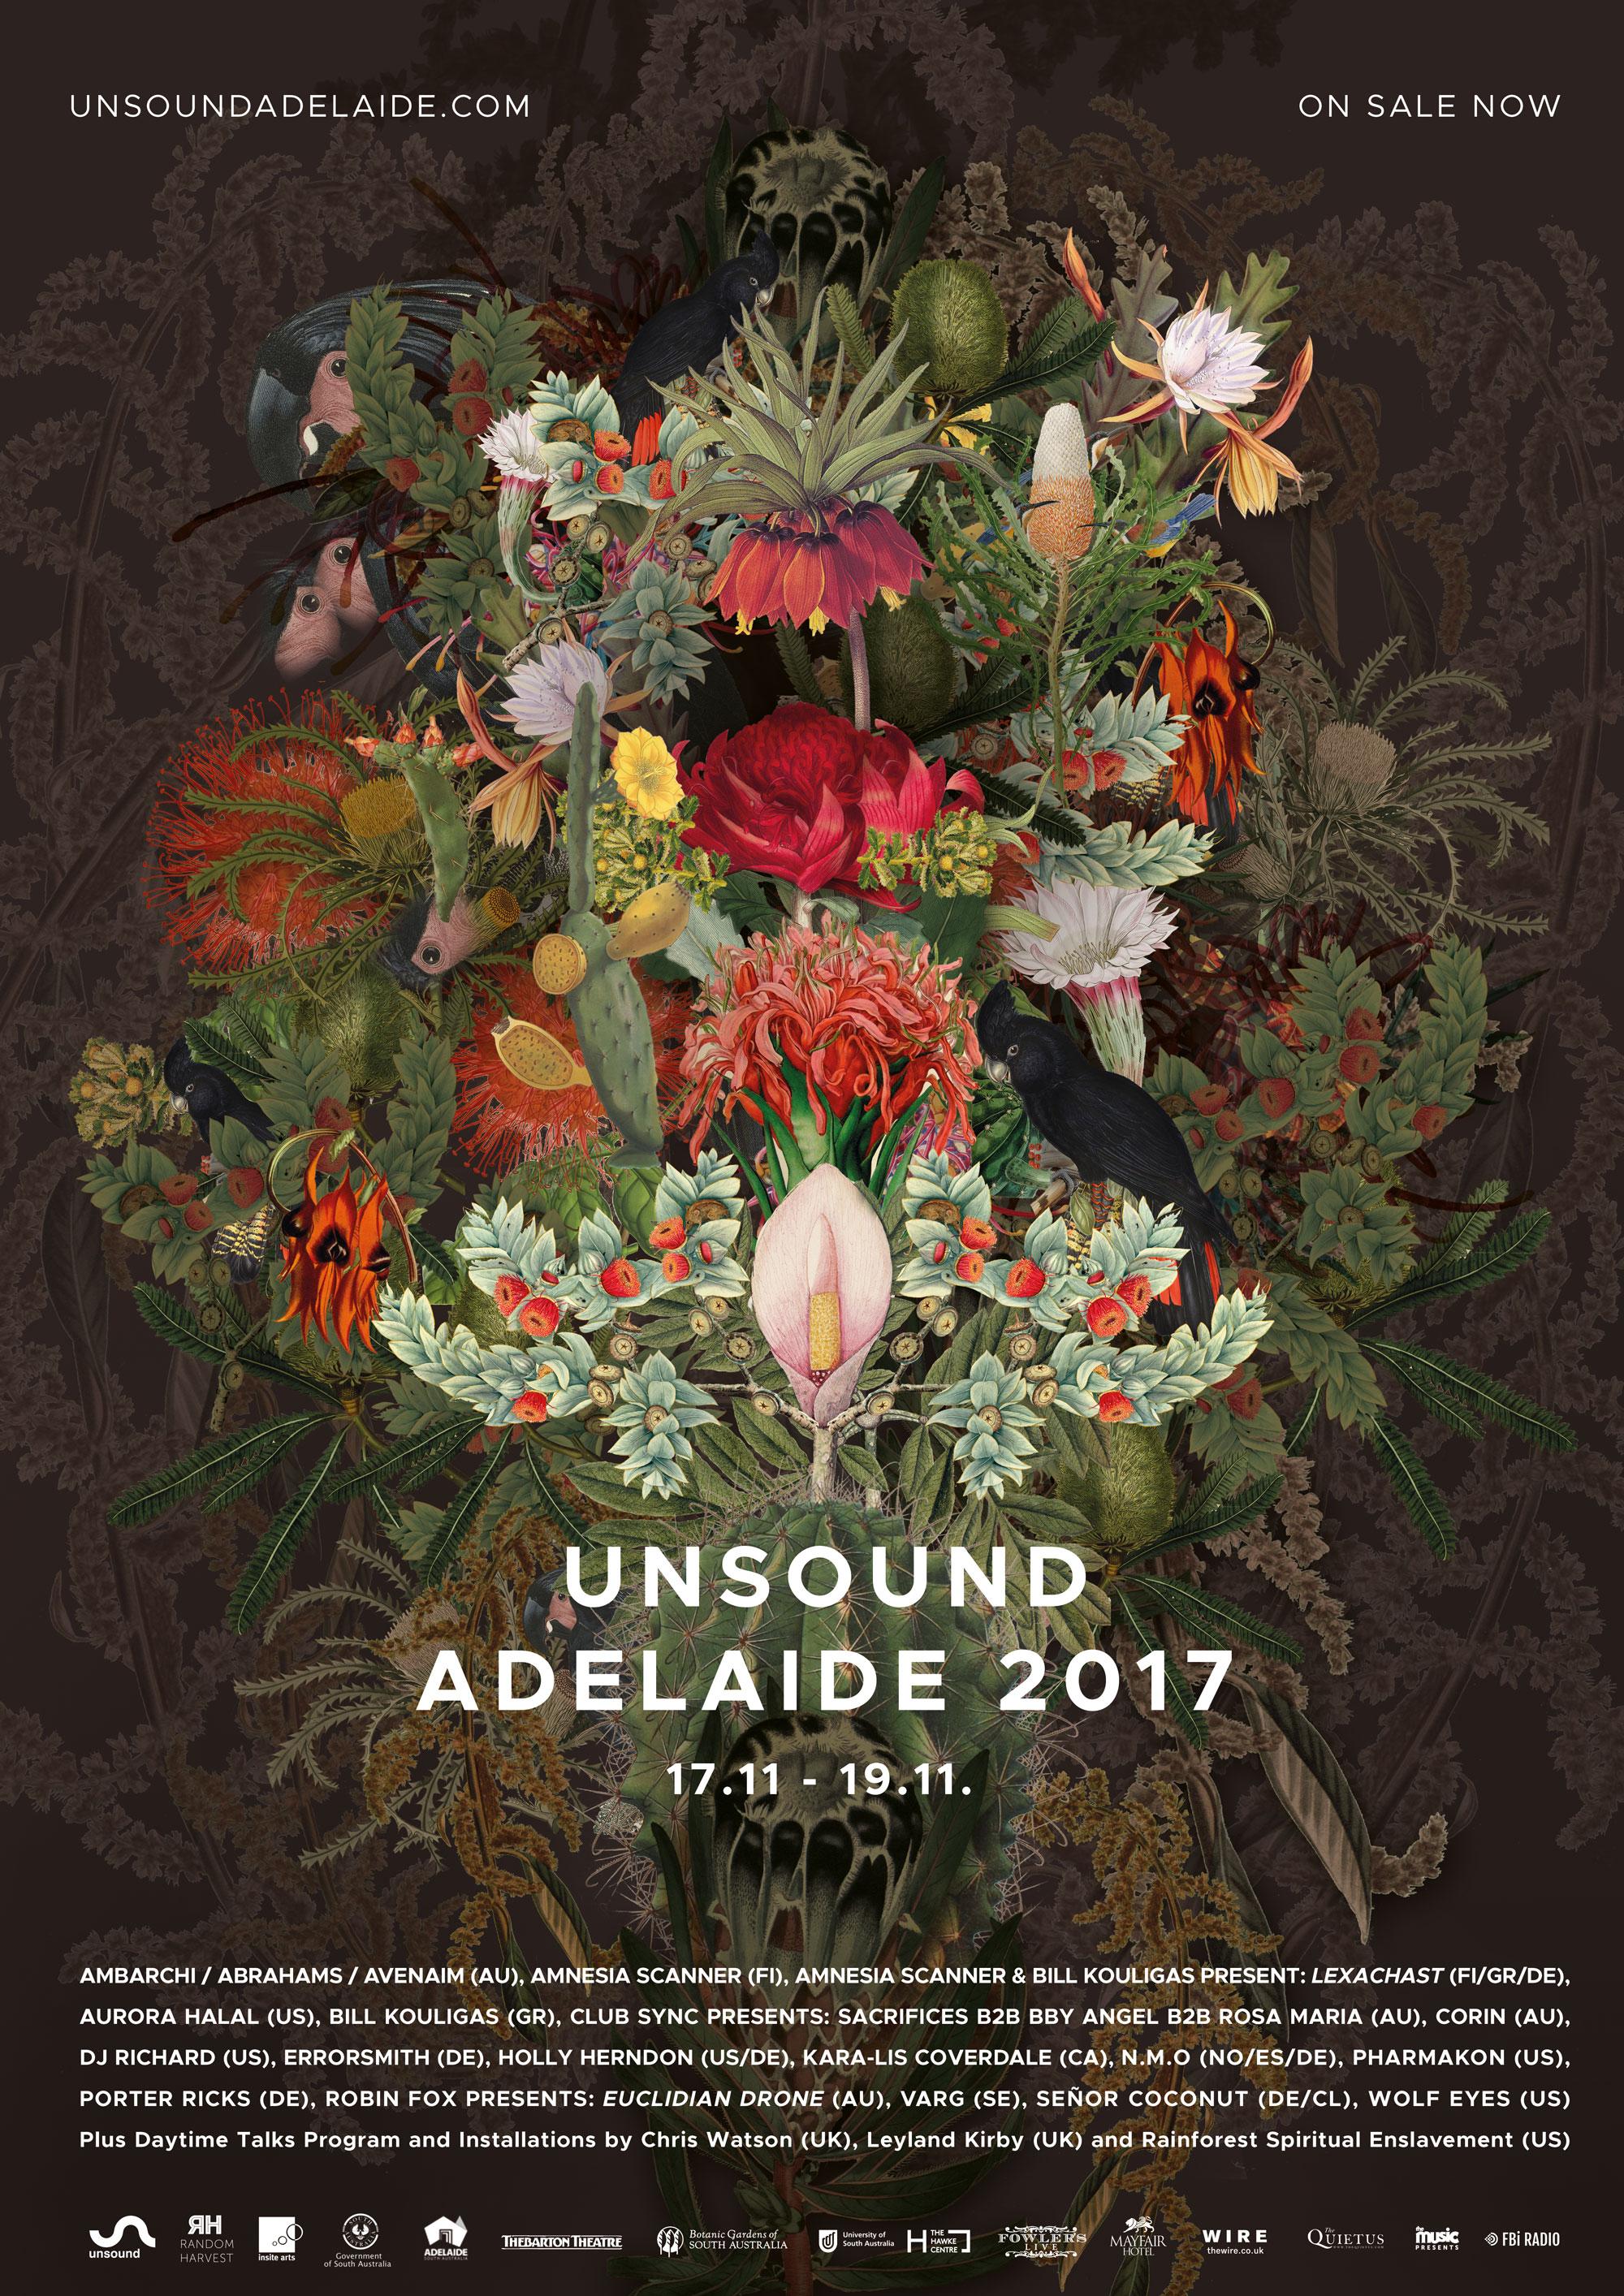 Unsound Adelaide 2017